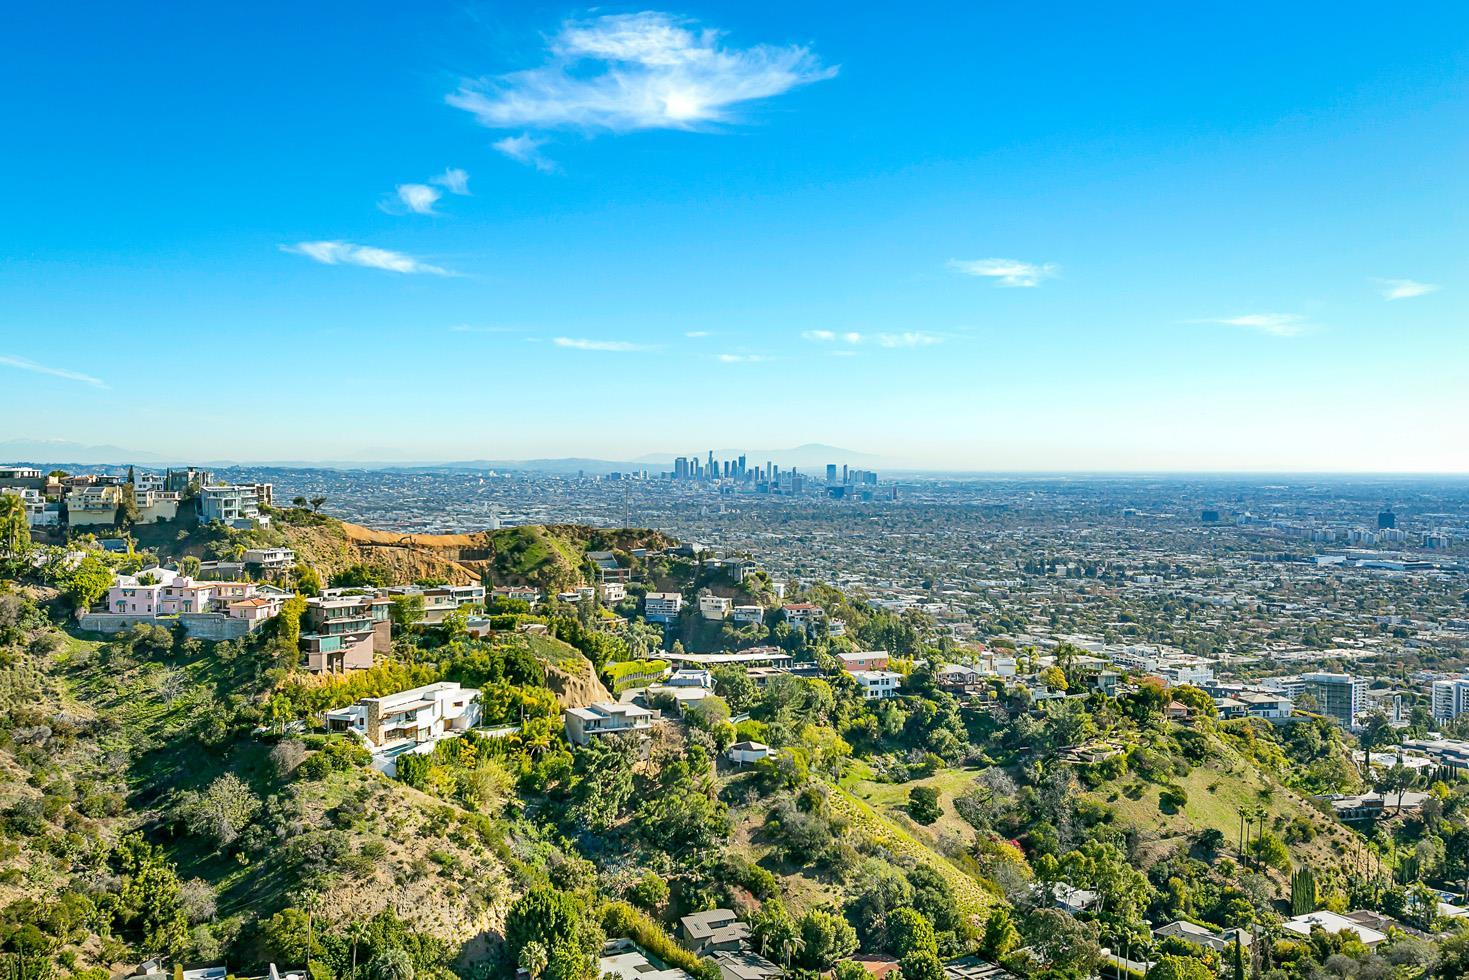 1550 BLUE JAY Way - Sunset Strip / Hollywood Hills West, California